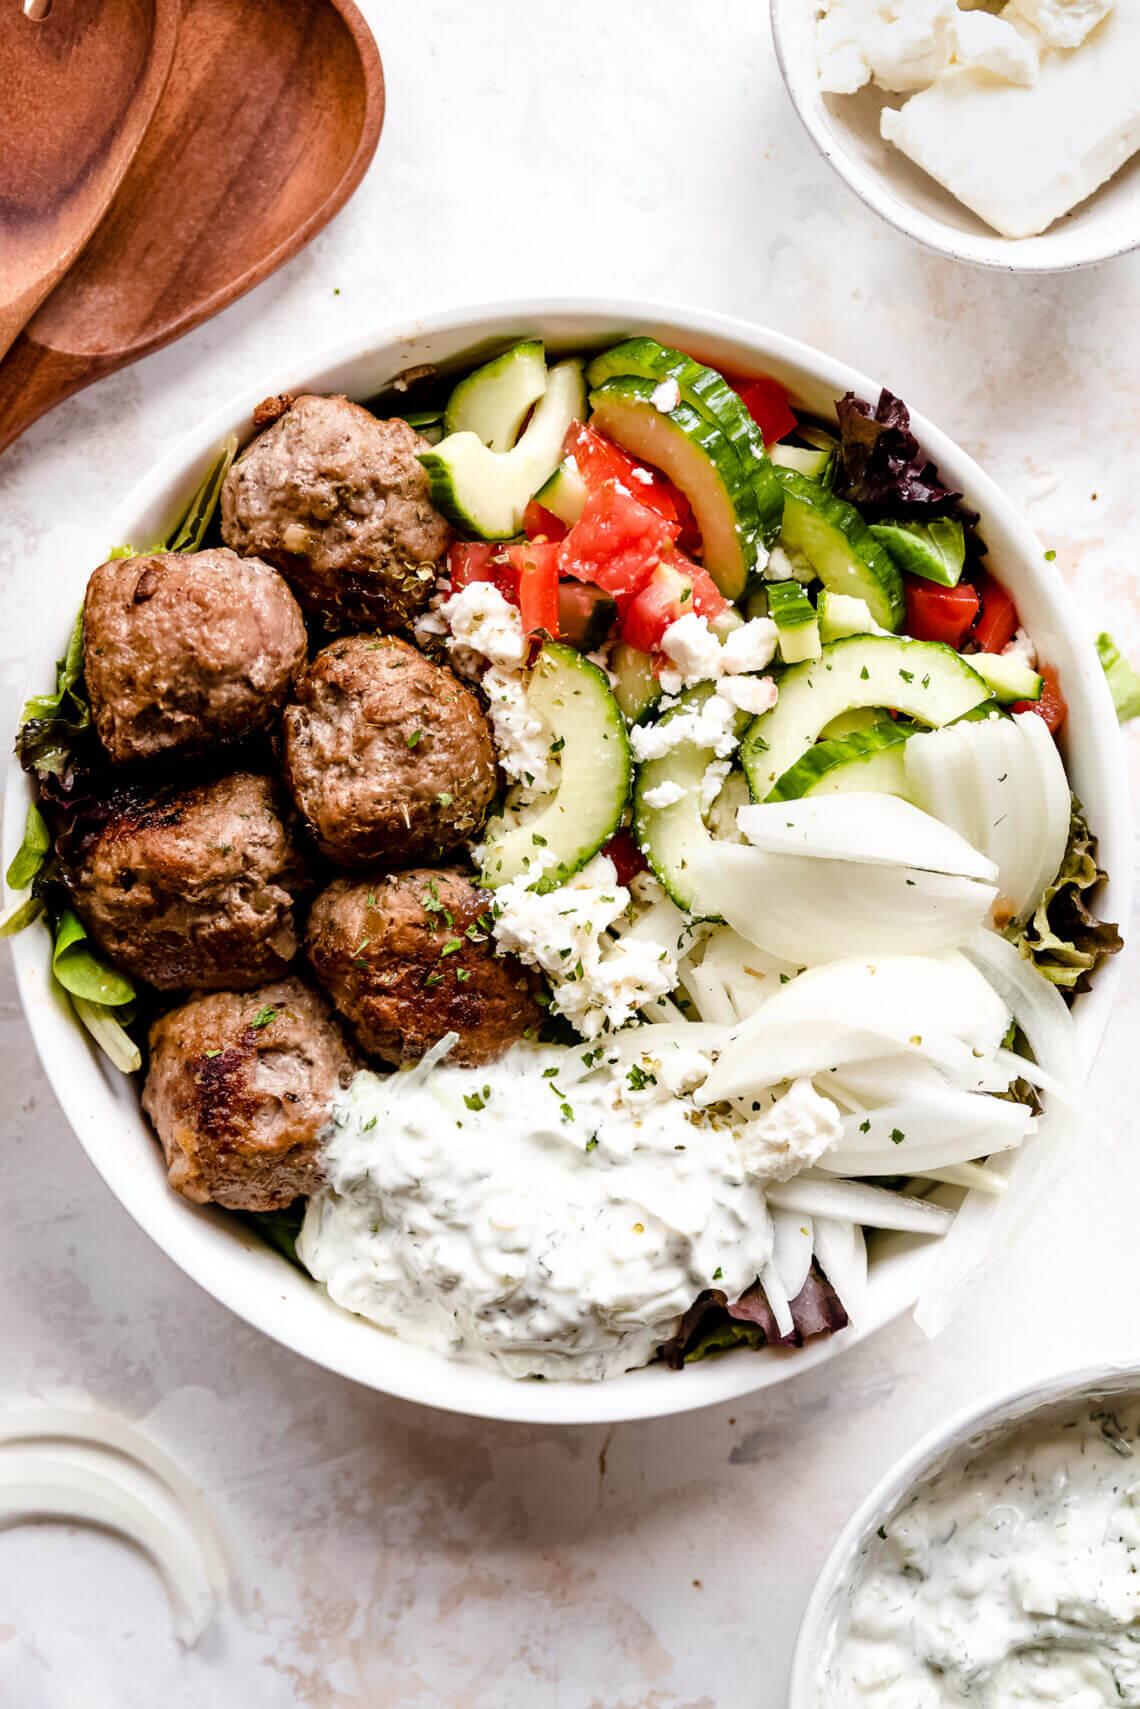 bifteki salade